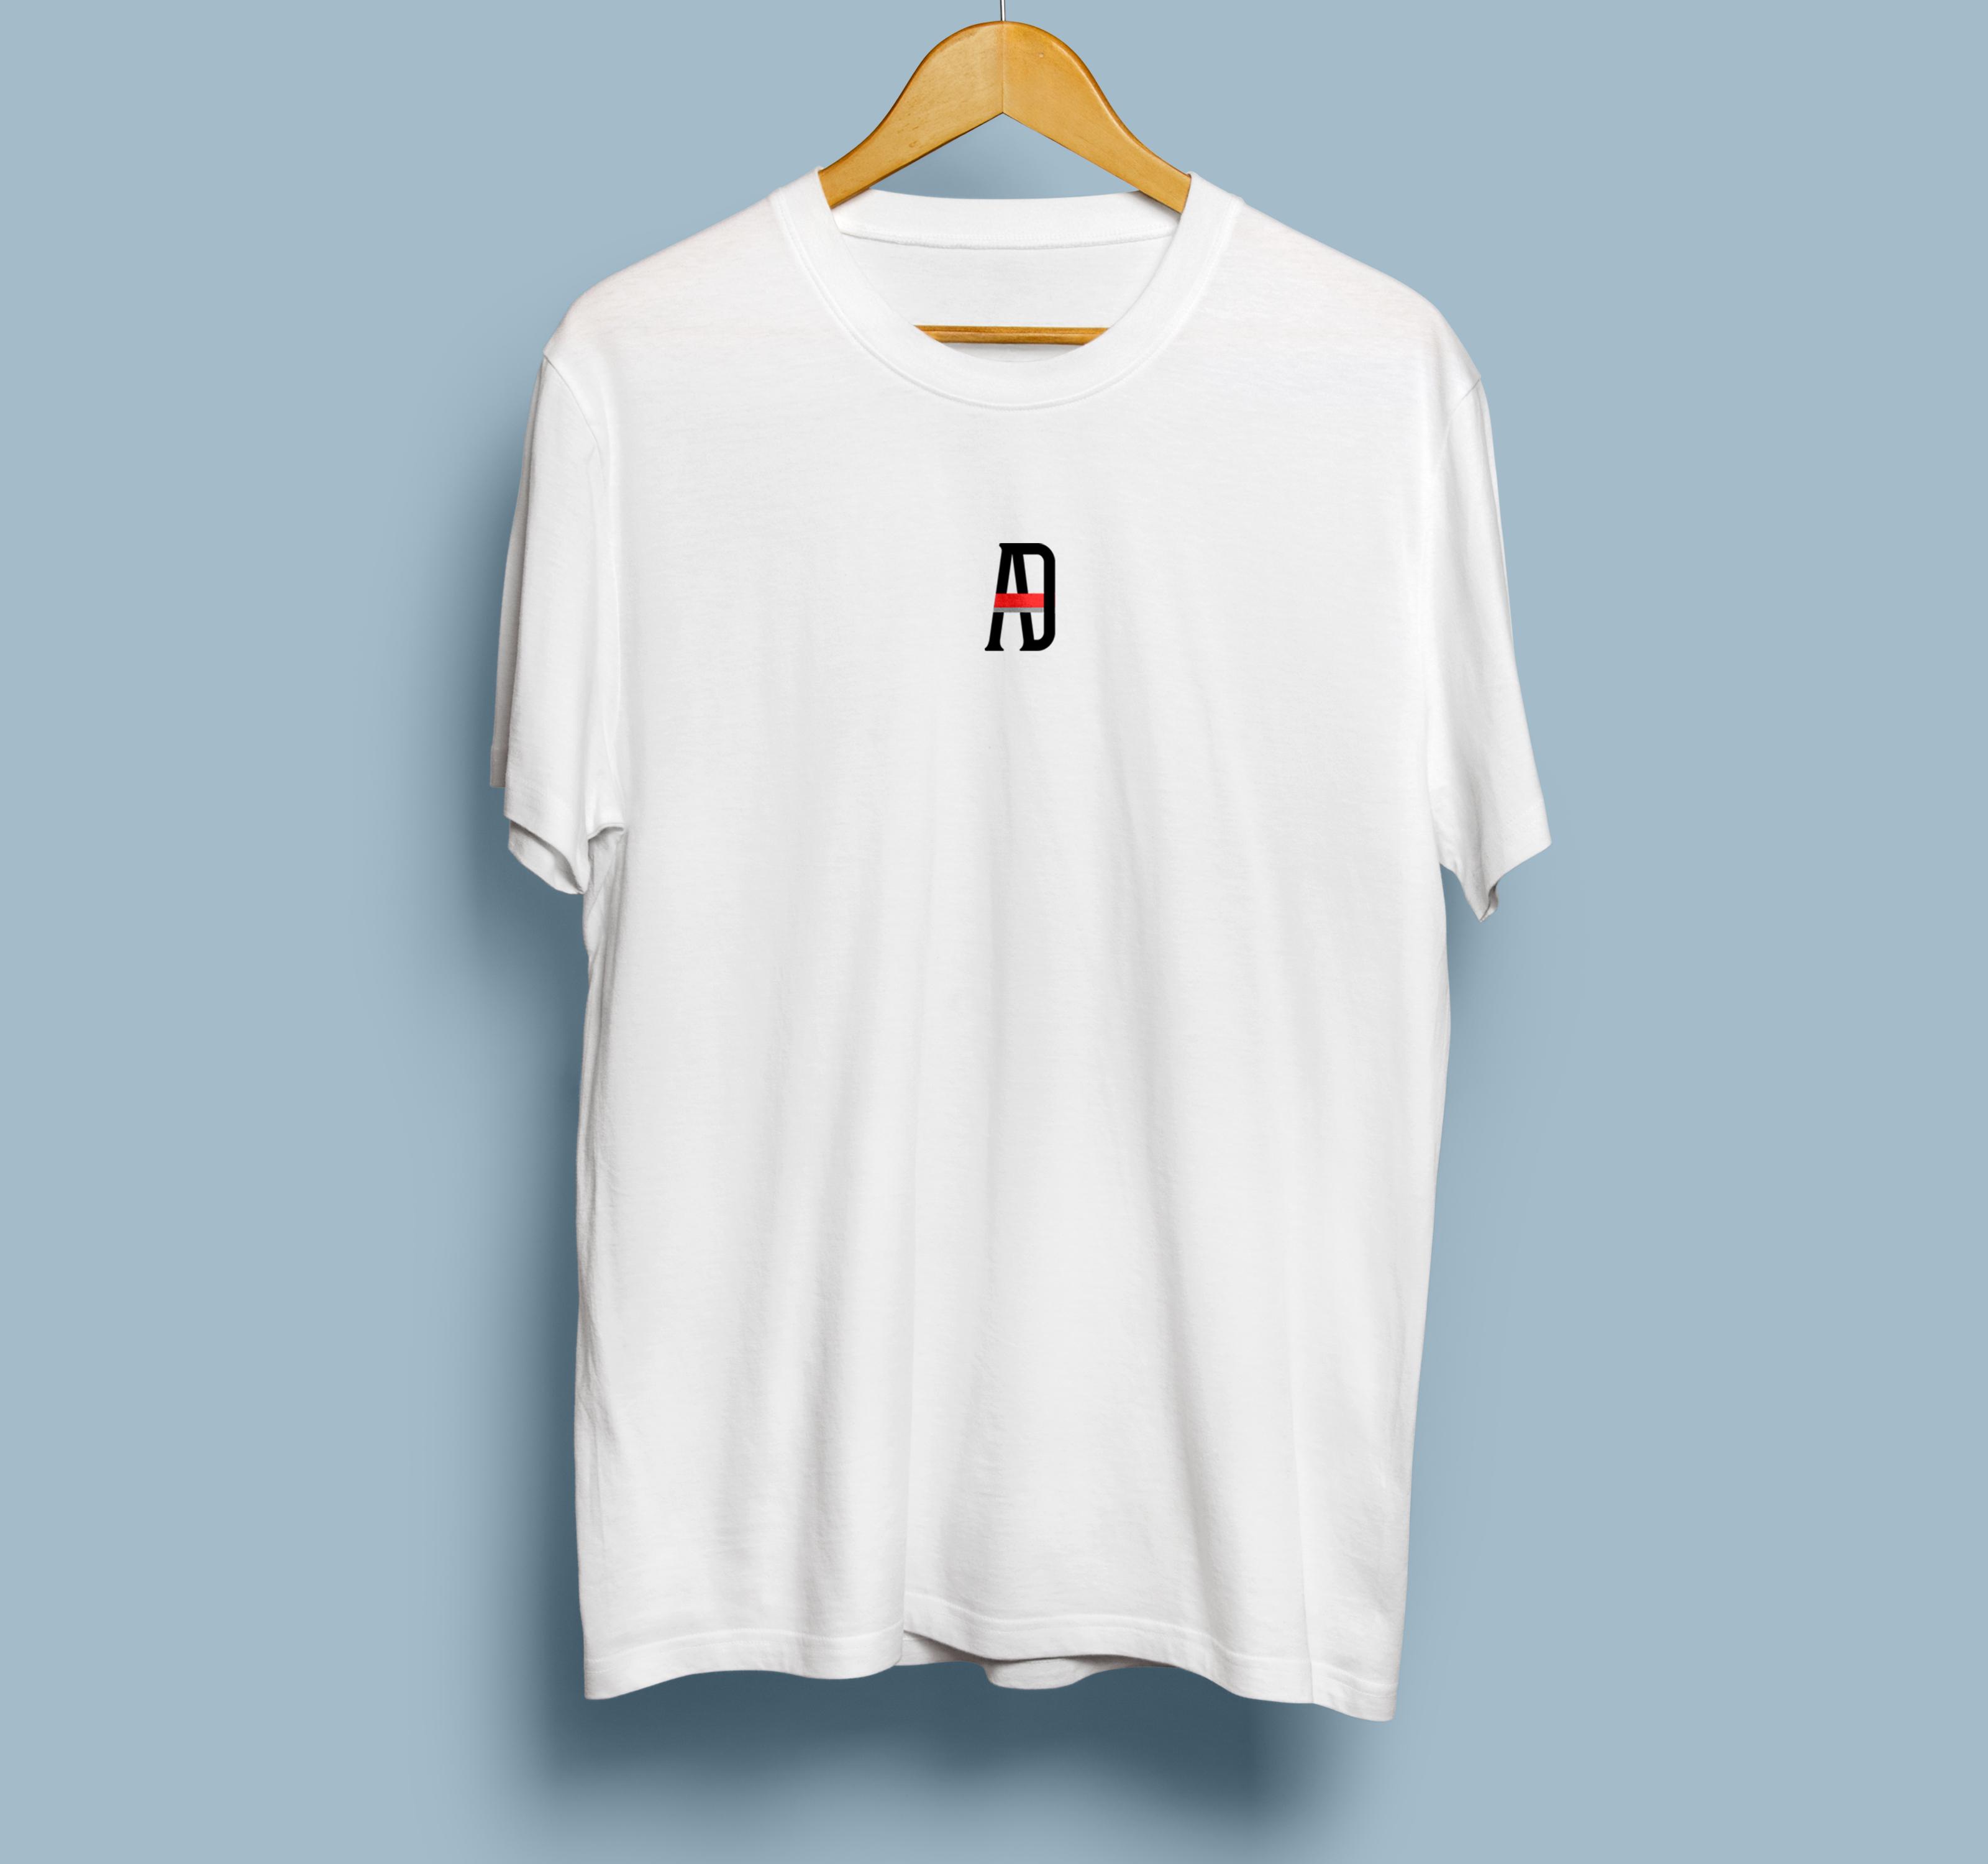 Необходим дизайнер для доработки логотипа бренда одежды фото f_2125b3557dc265b8.jpg